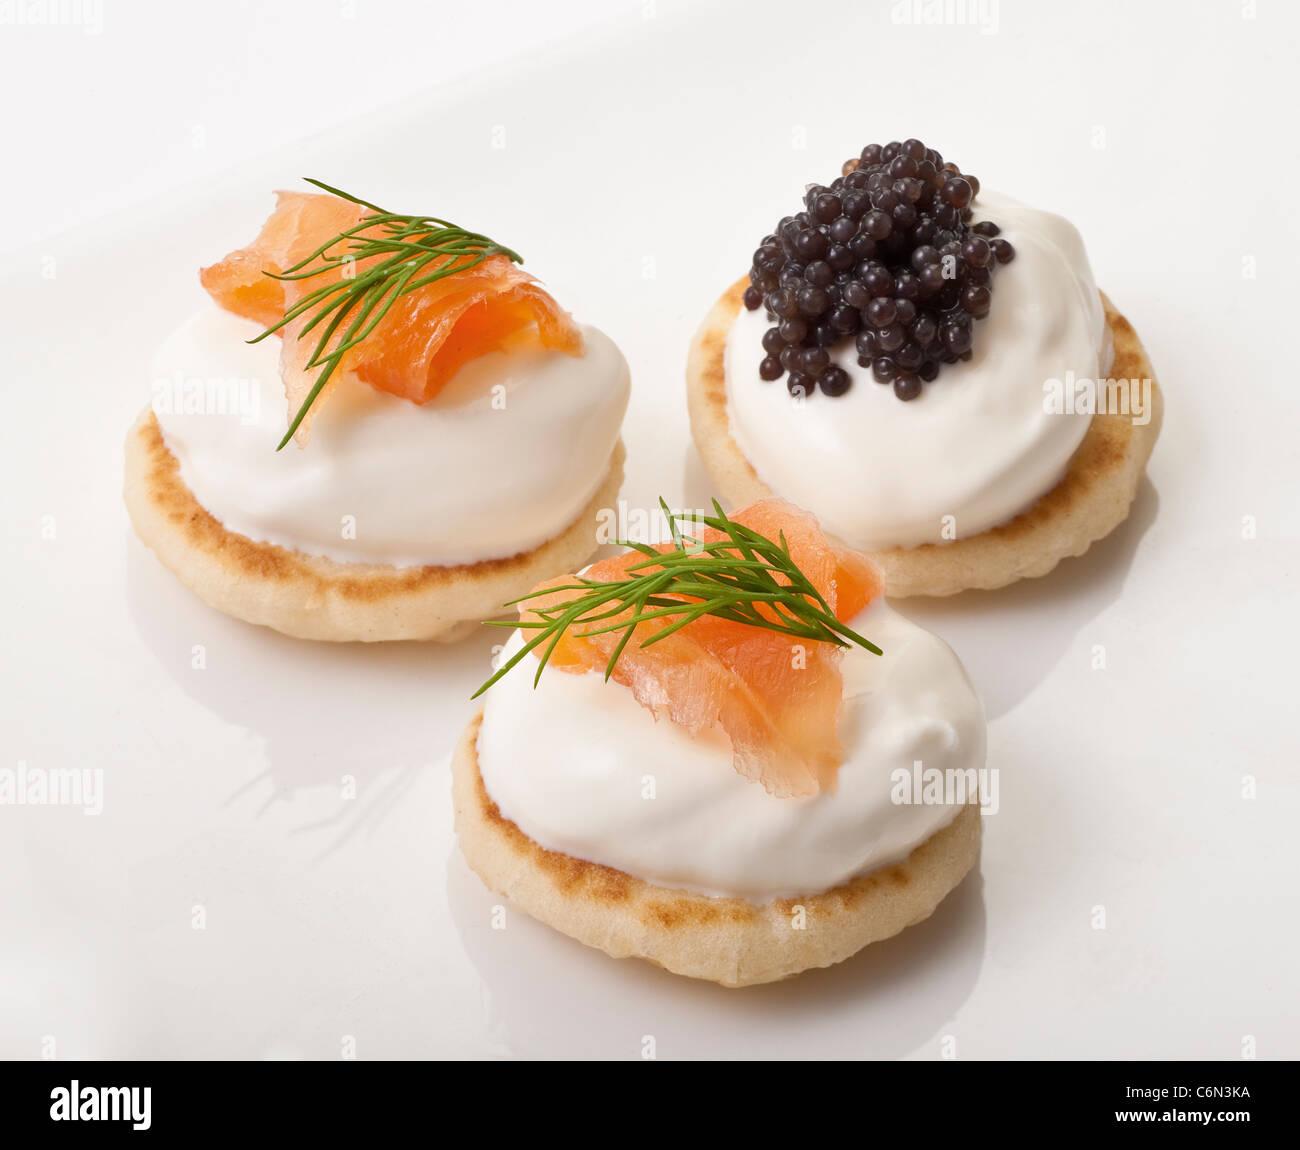 Salmon & Caviar Canapes - Stock Image